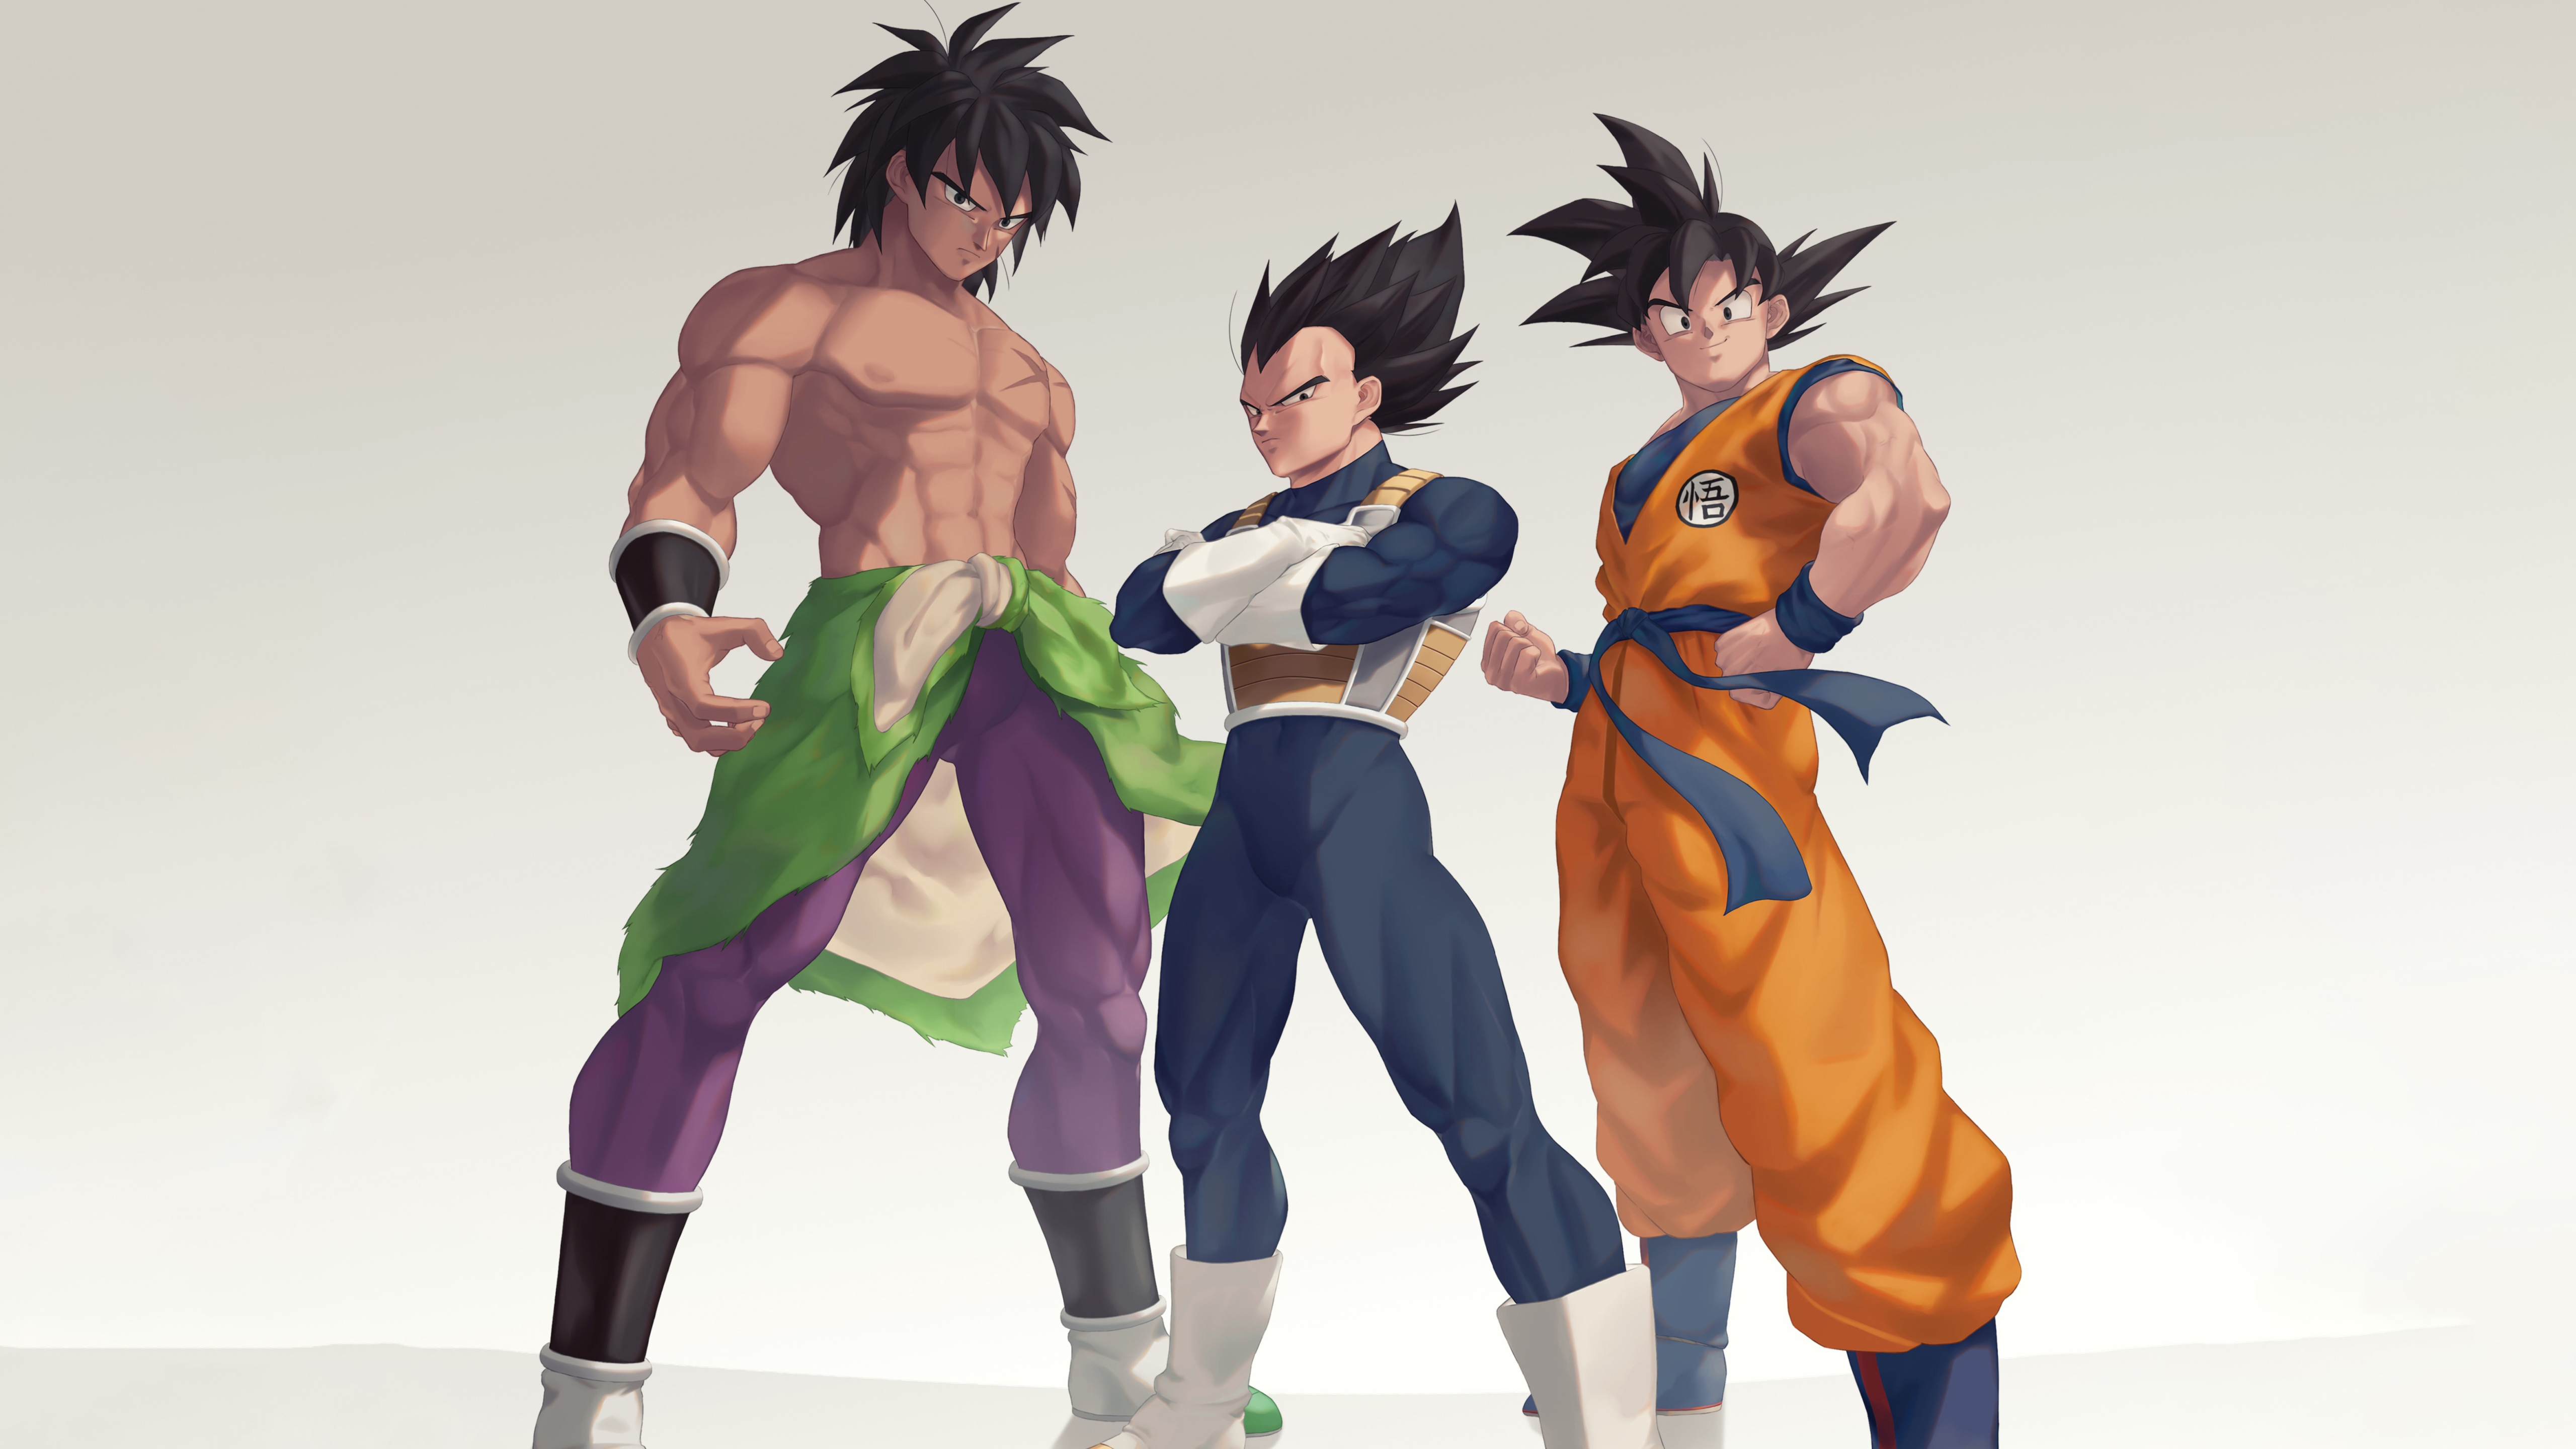 5120x2880 Broly Goku and Vegeta 5K